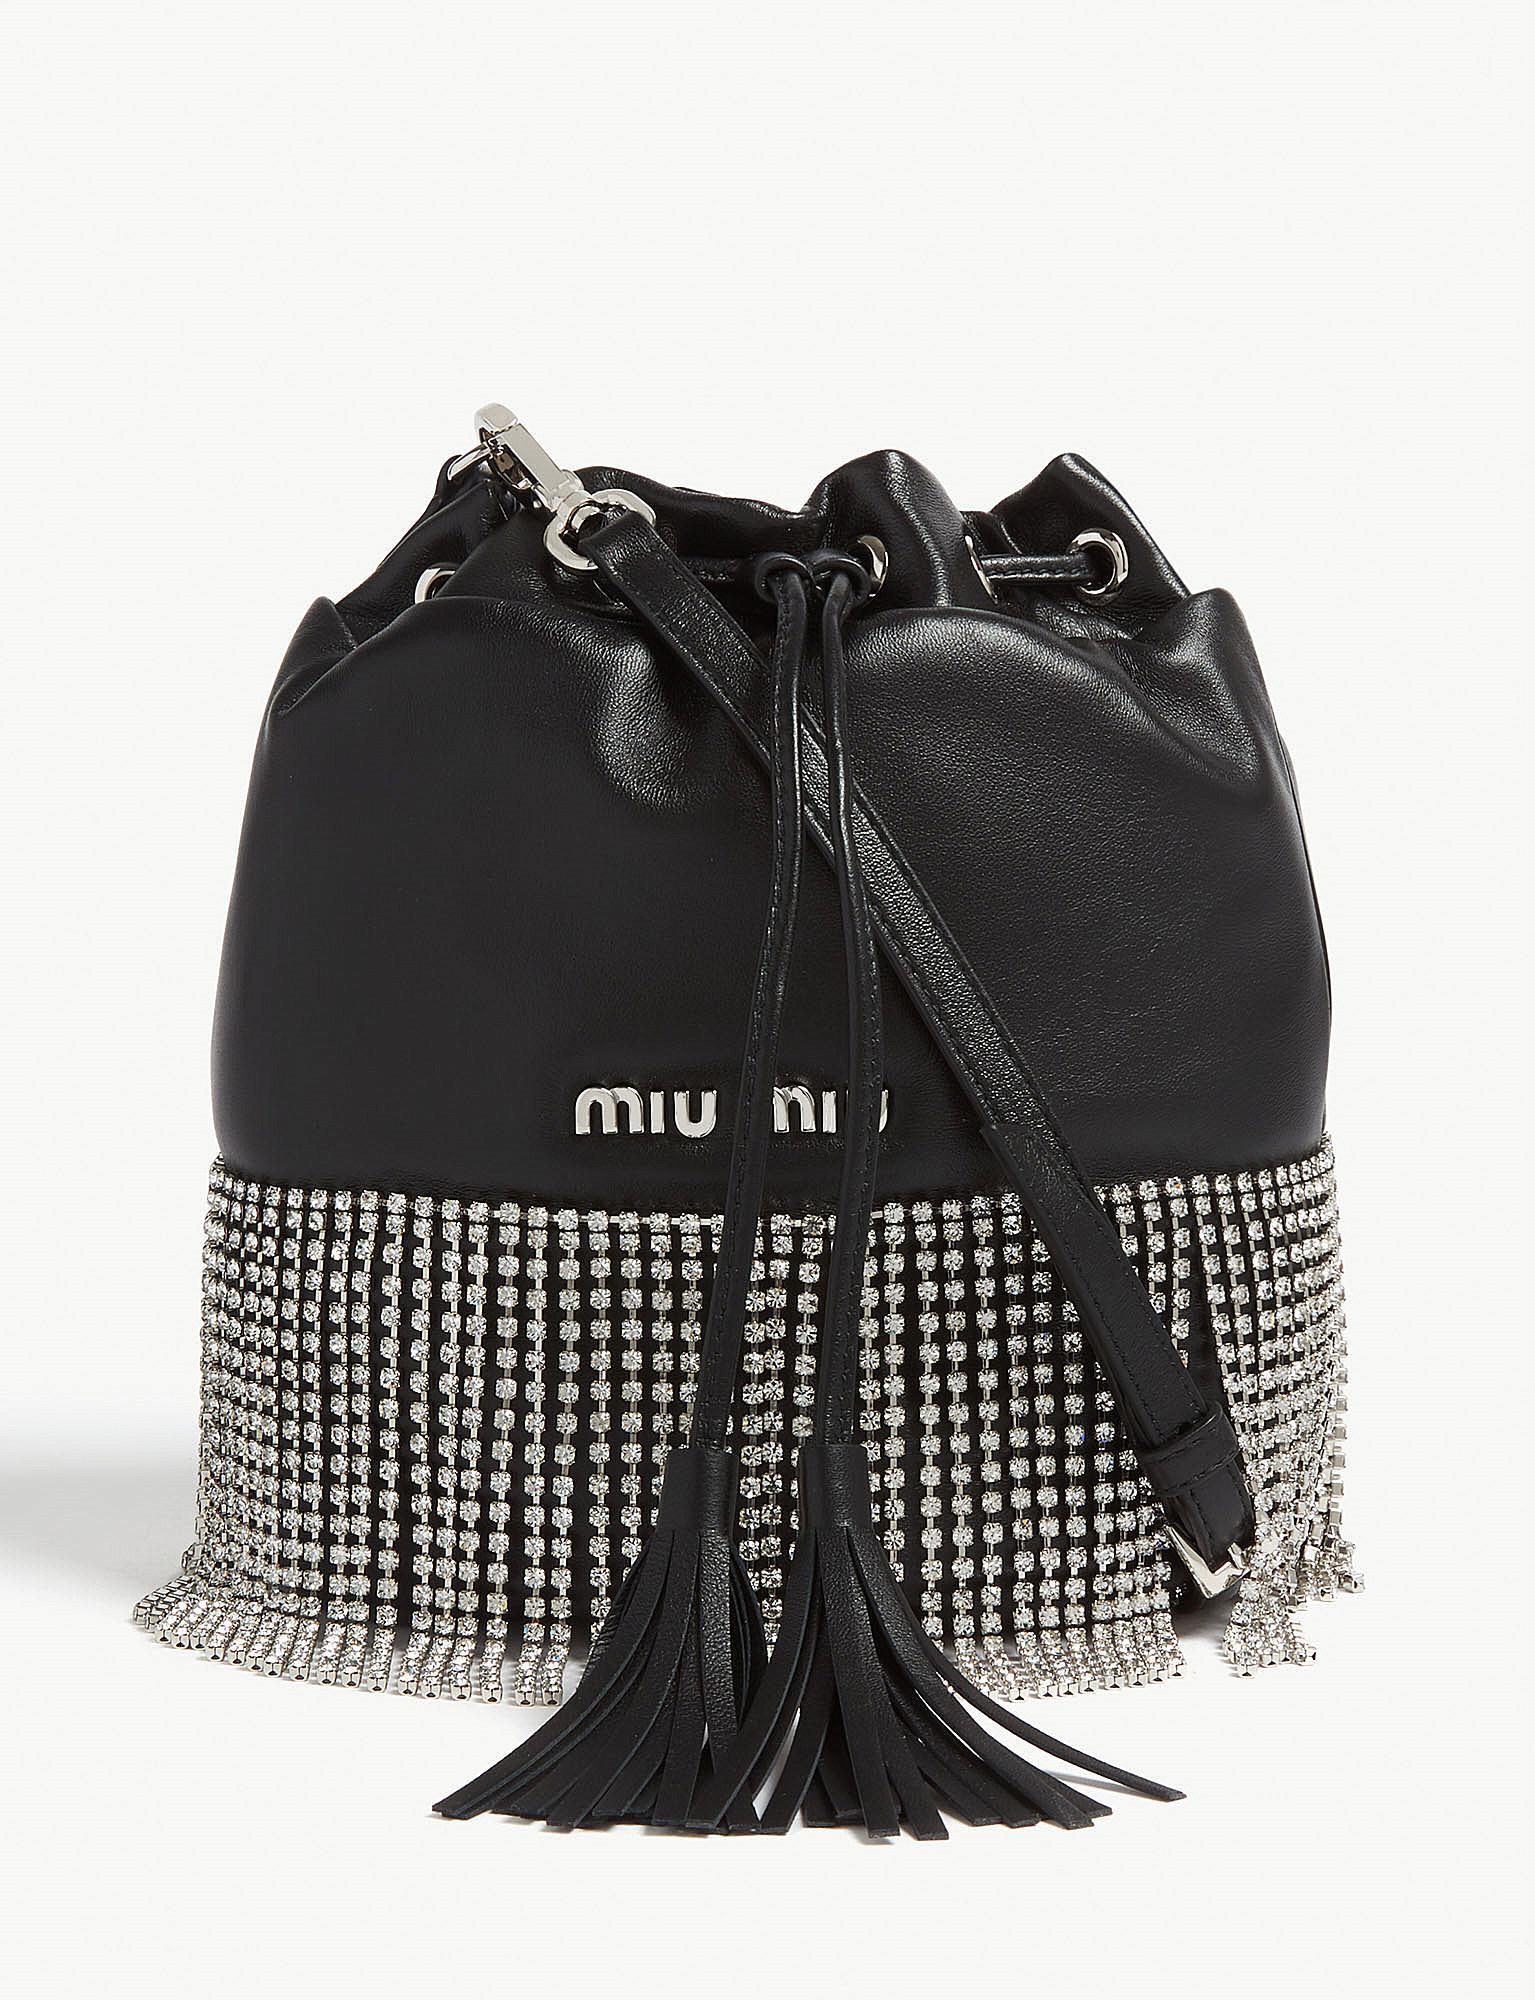 cbd6d1974d8 Lyst - Miu Miu Crystal Fringe Leather Bucket Bag in Black